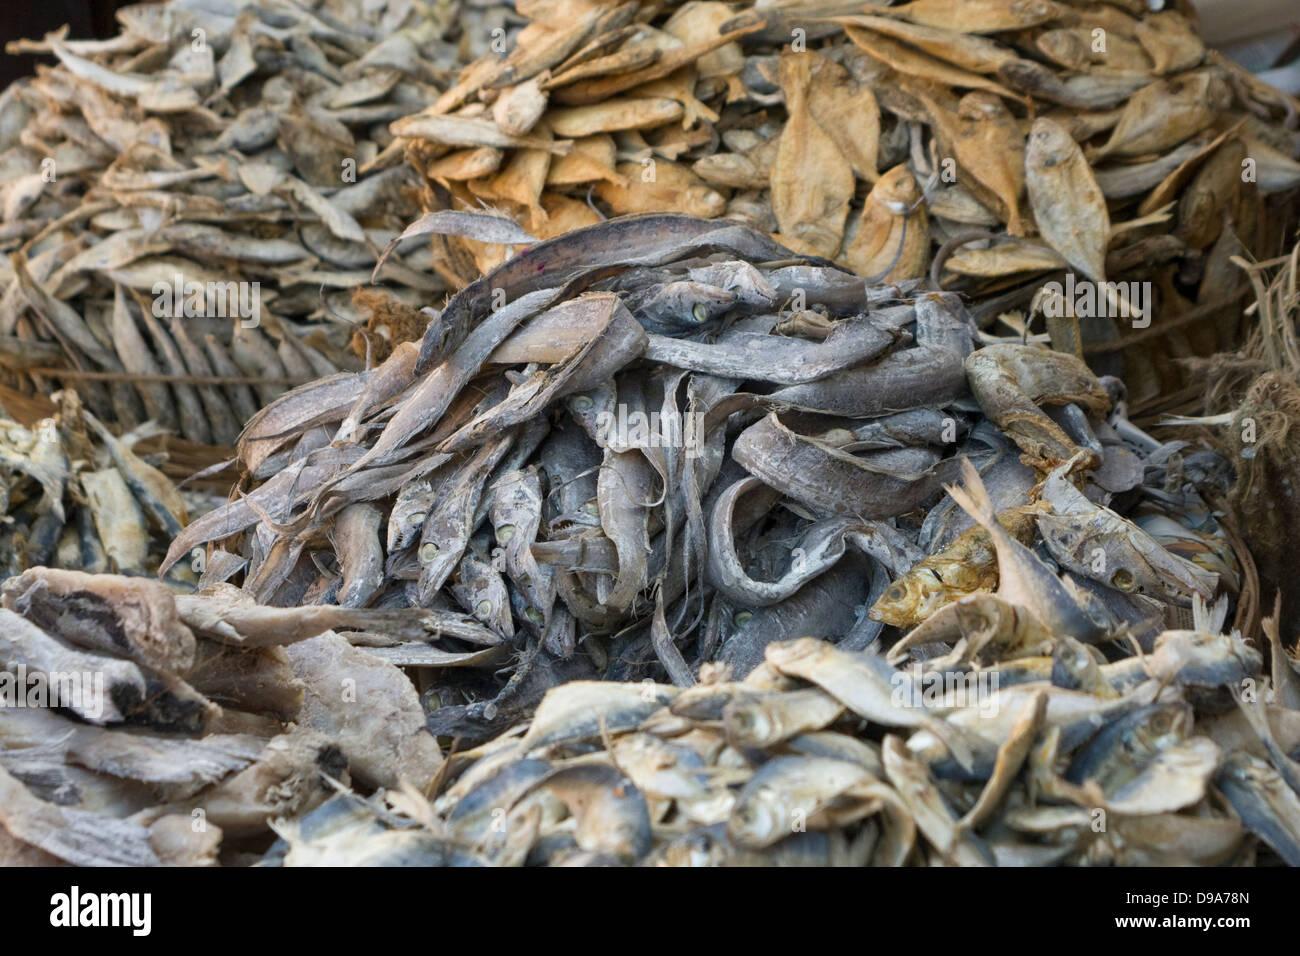 Asia, India, Karnataka, Madikeri, dried fish on the market - Stock Image